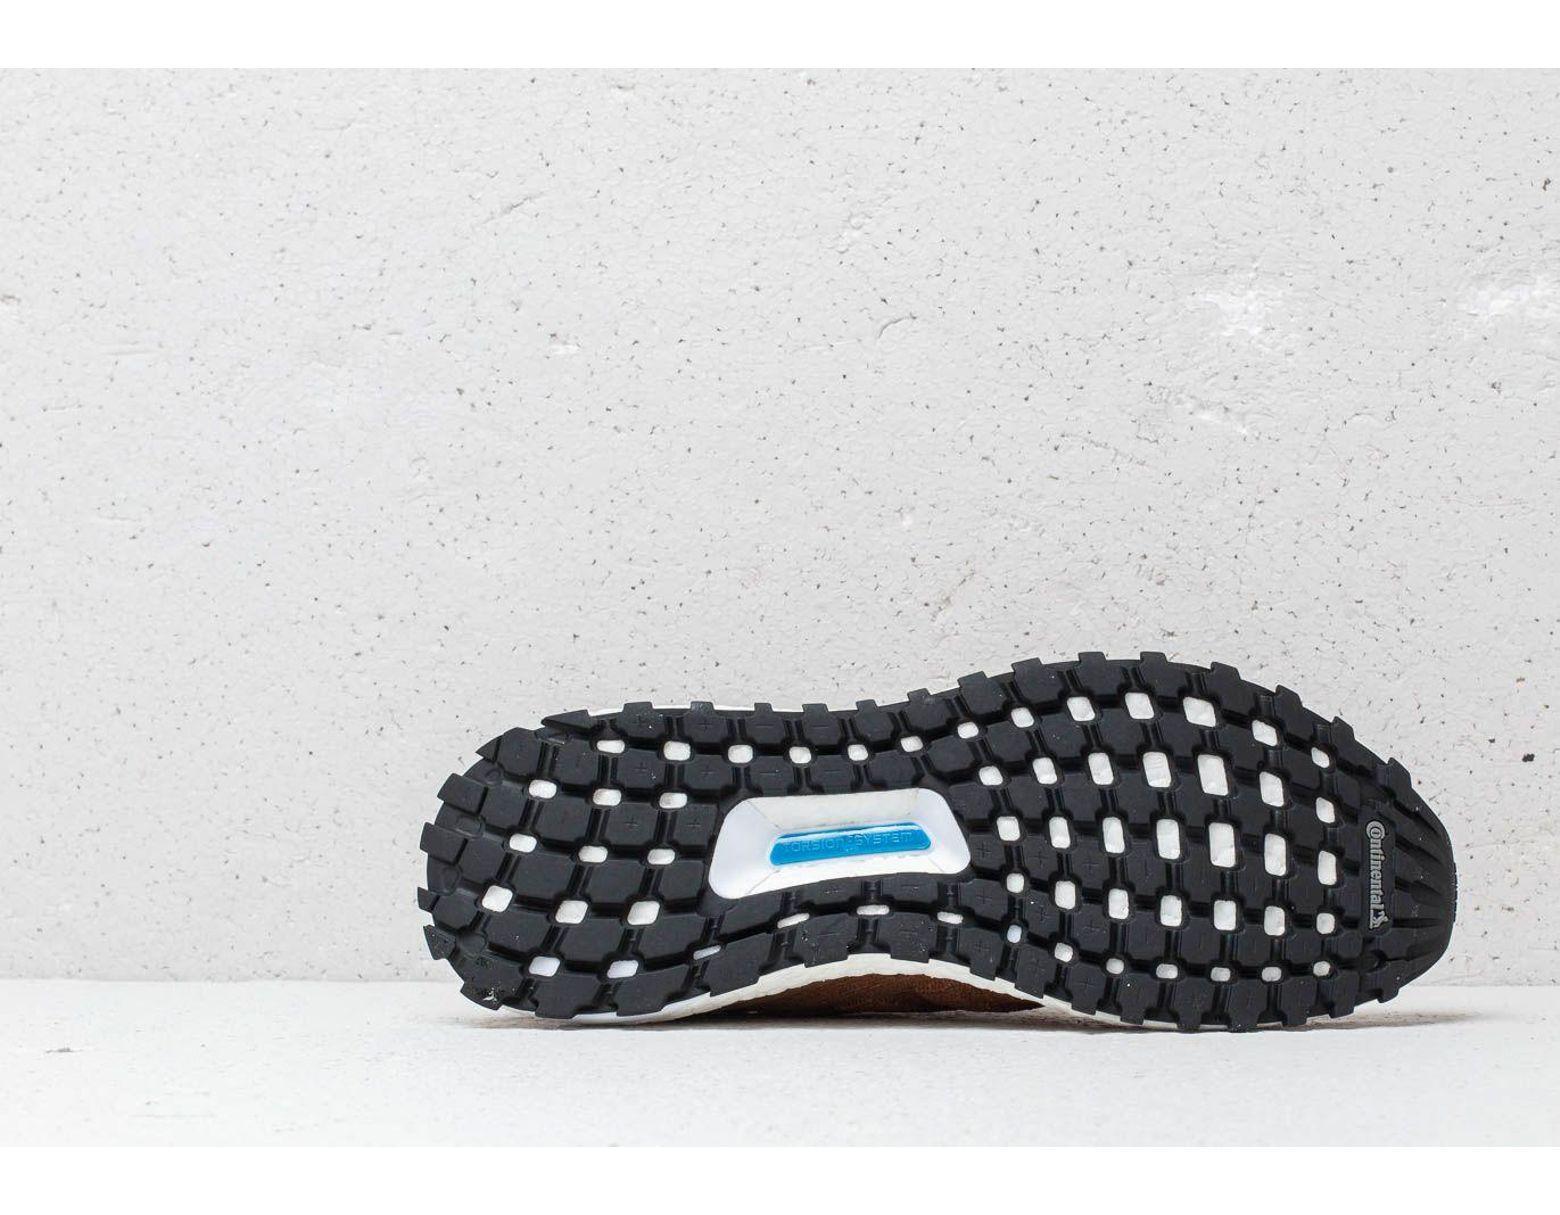 6ac8f3a8639f5 Lyst - adidas Originals Adidas Ultraboost All Terrain Raw Desert  Core Black   Cloud White for Men - Save 30%